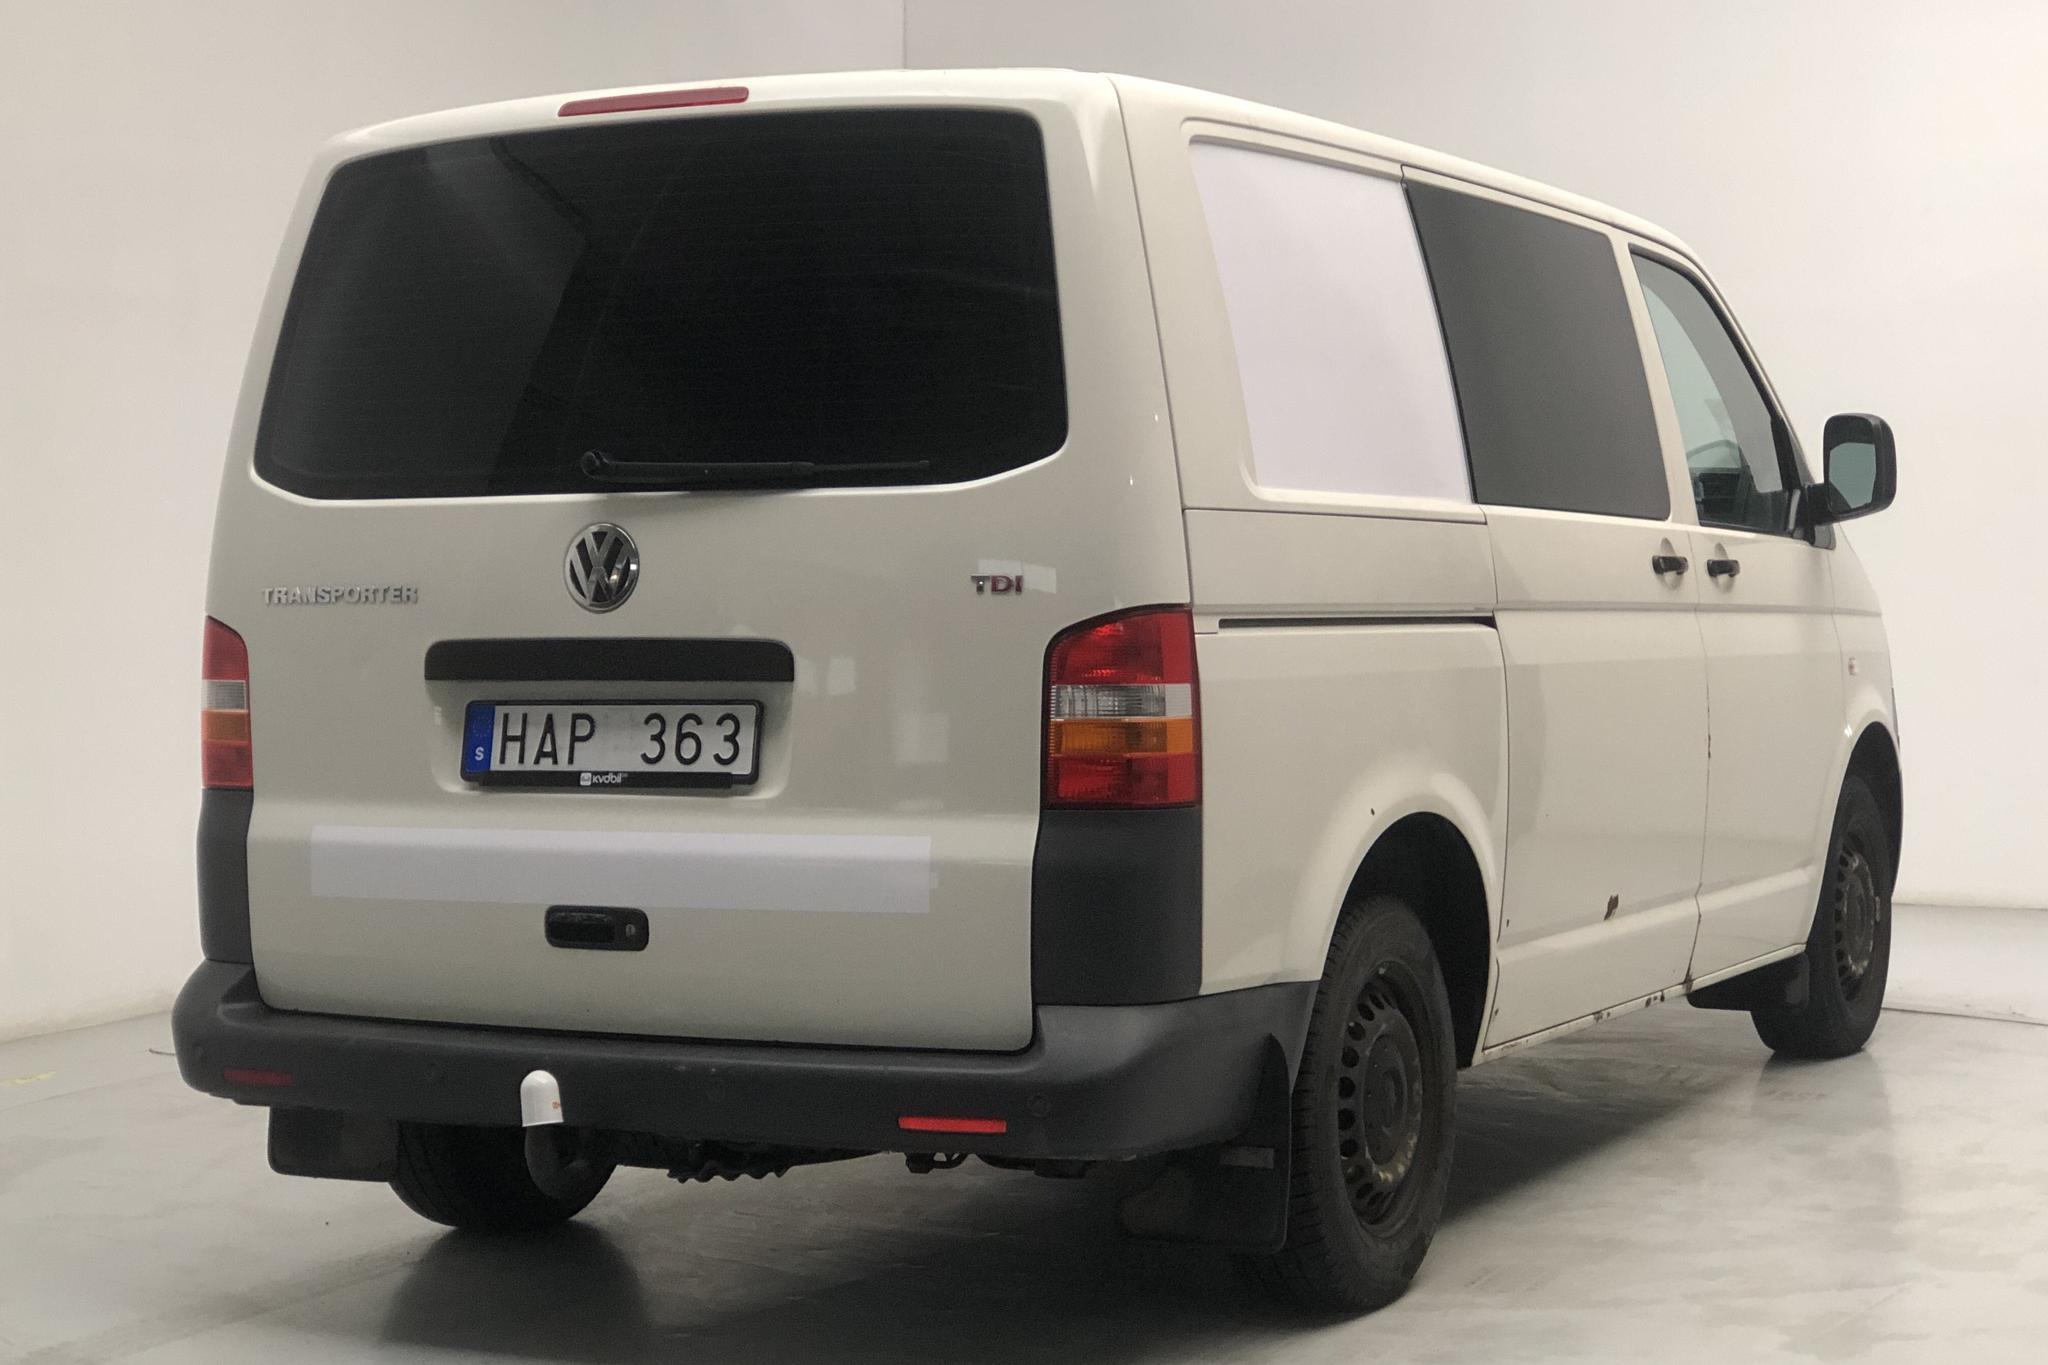 VW Transporter T5 2.5 TDI (130hk) - 156 670 km - Automatic - white - 2008